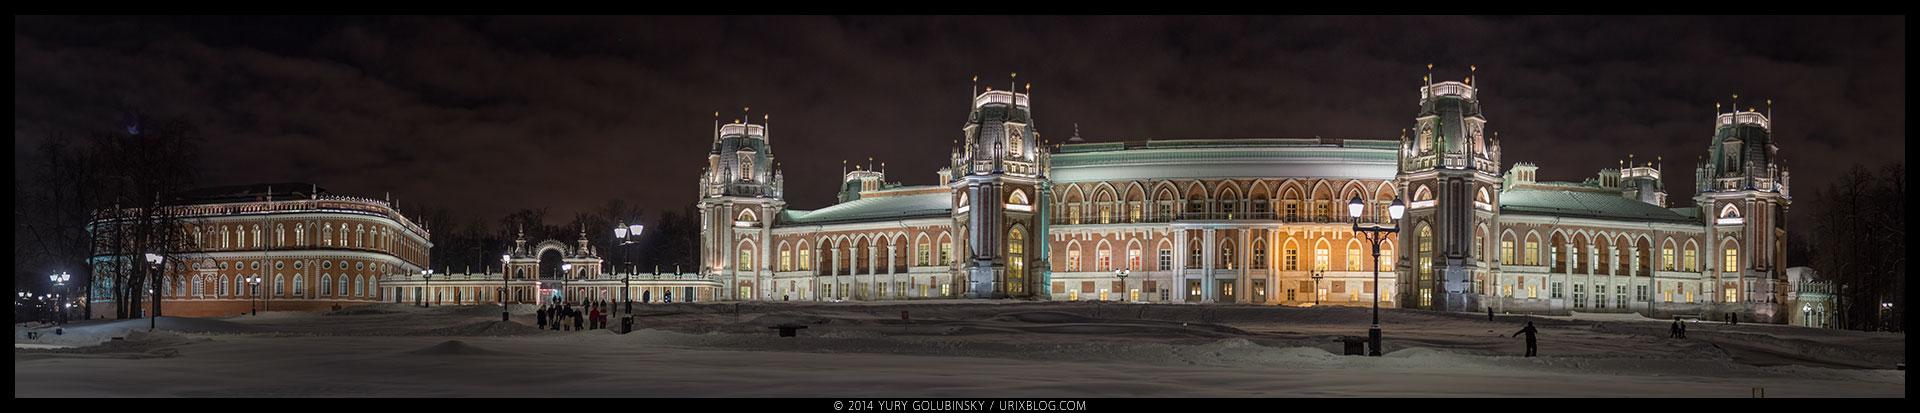 night, Tsaritsyno, palace, architecture, Moscow, Russia, winter, January, panorama, 2015